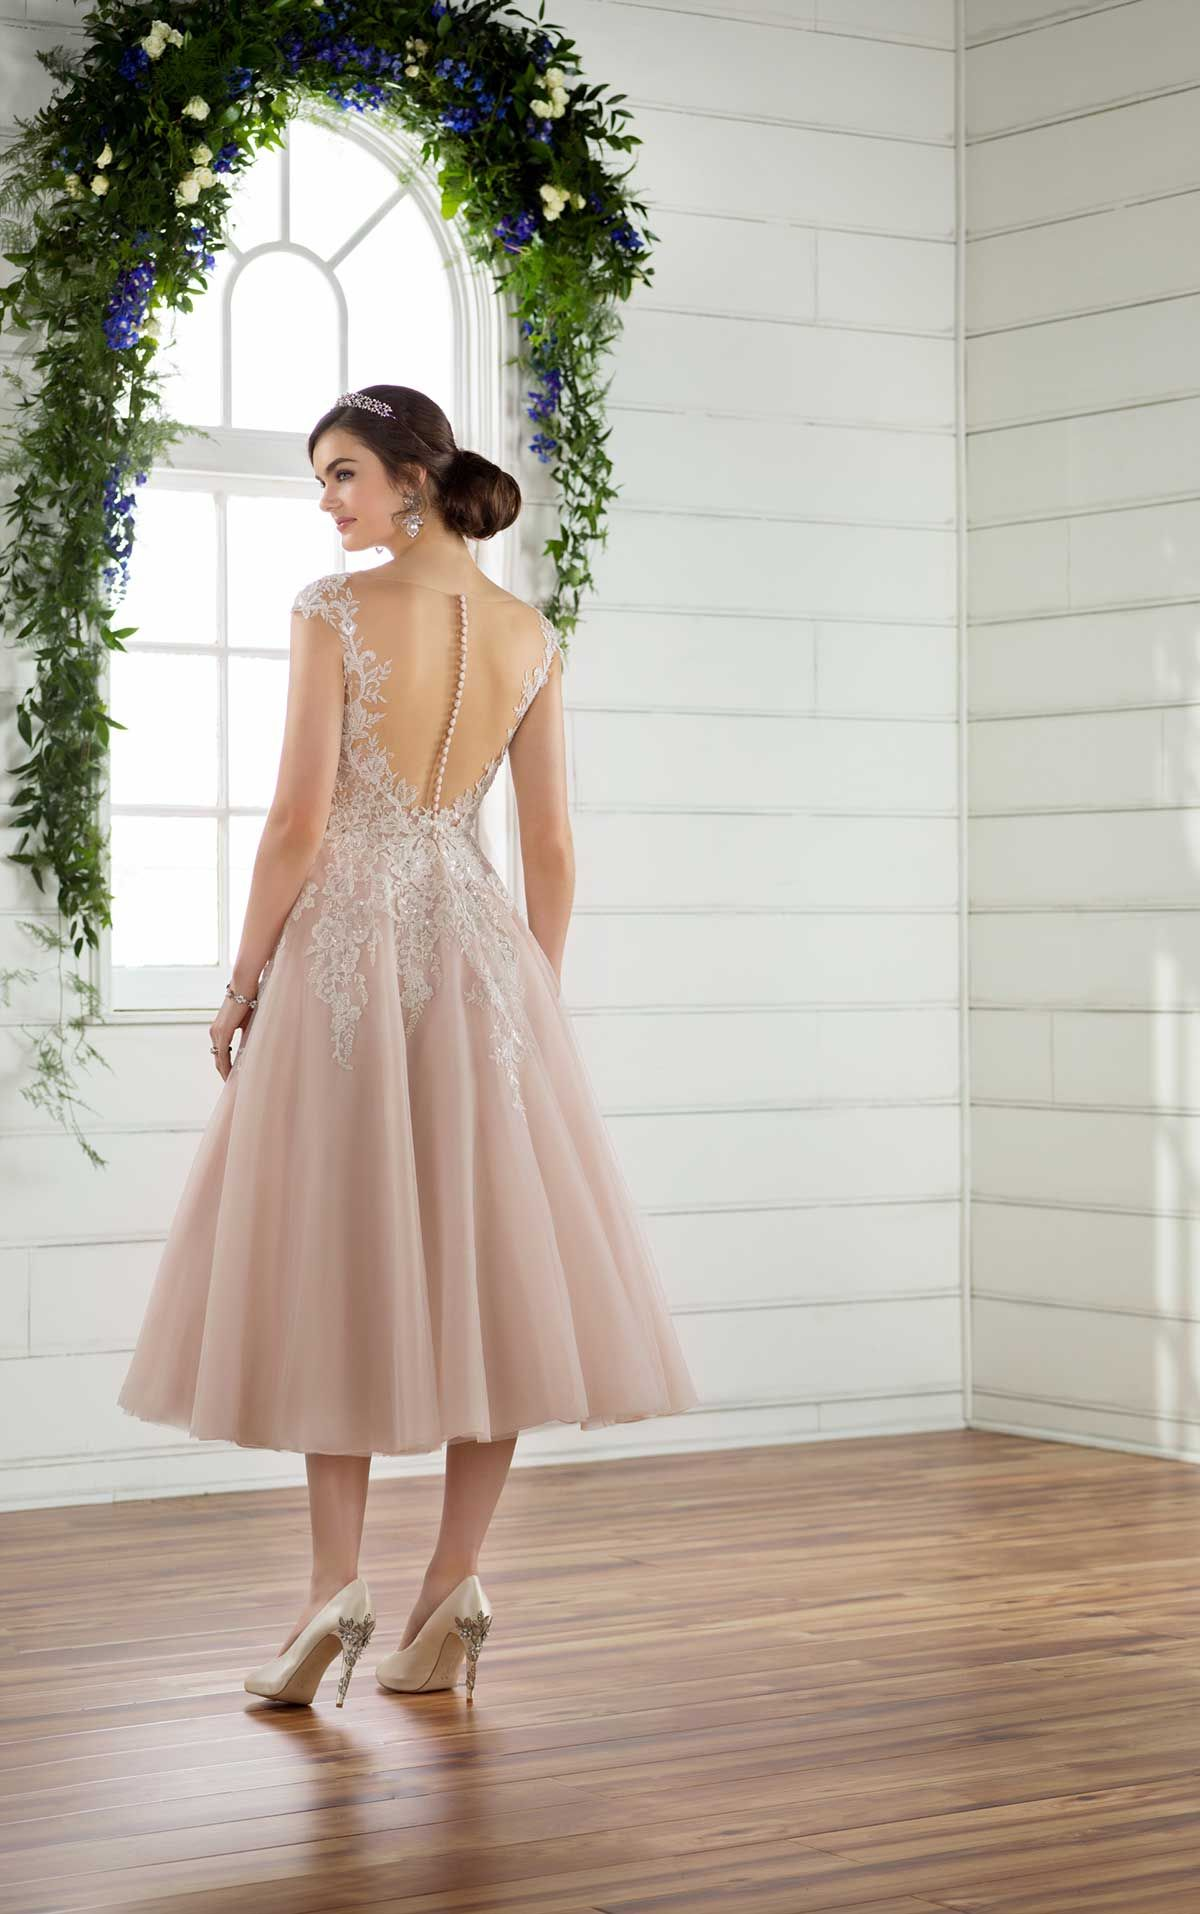 Short And Sweet Wedding Dress Short Wedding Dress Short Lace Wedding Dress Sweet Wedding Dresses [ 1914 x 1200 Pixel ]